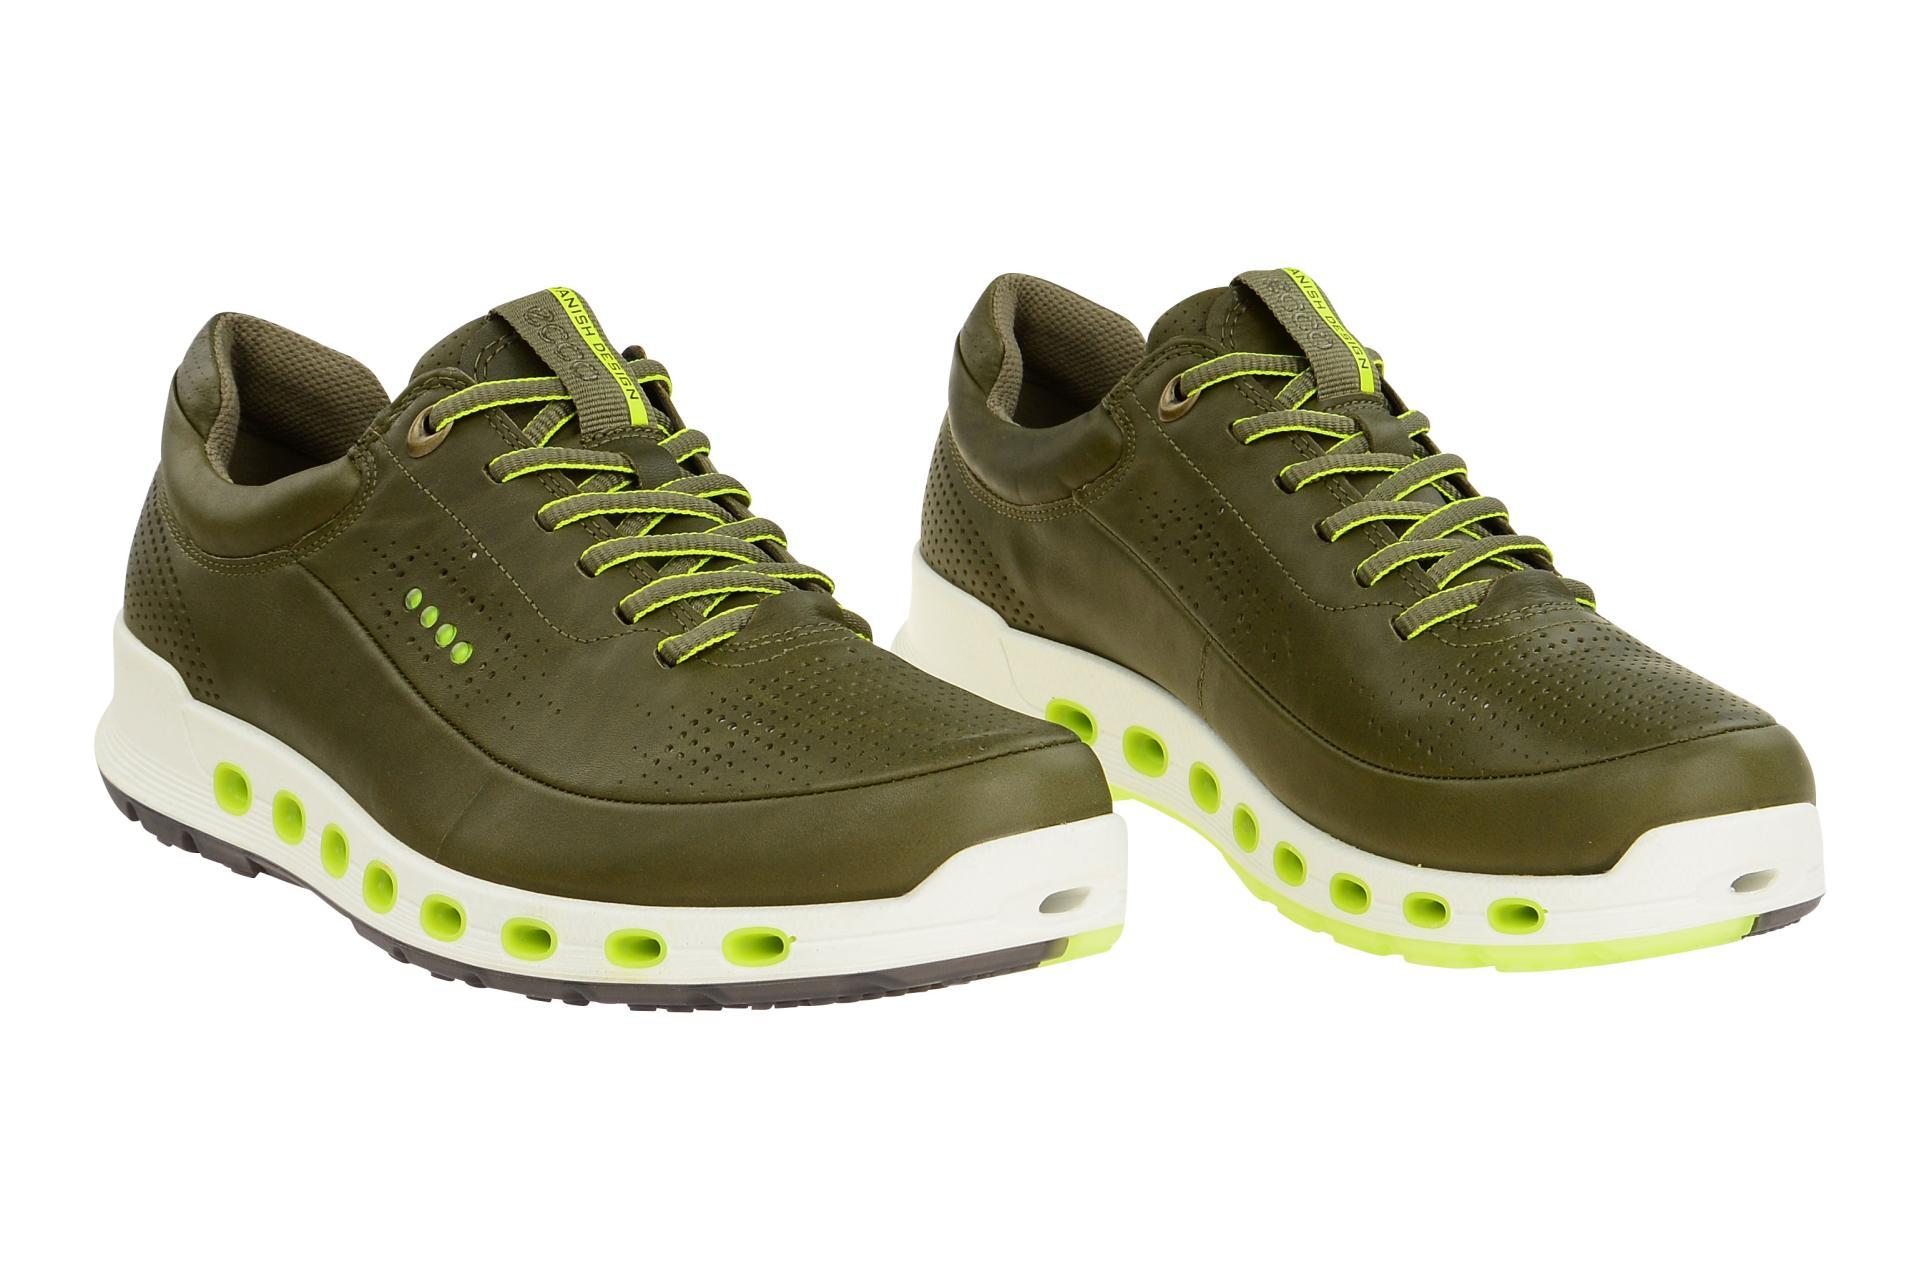 47167f9dbb144e Ecco Schuhe COOL 2.0 grün Herrenschuhe Sneakers 84251401543 NEU